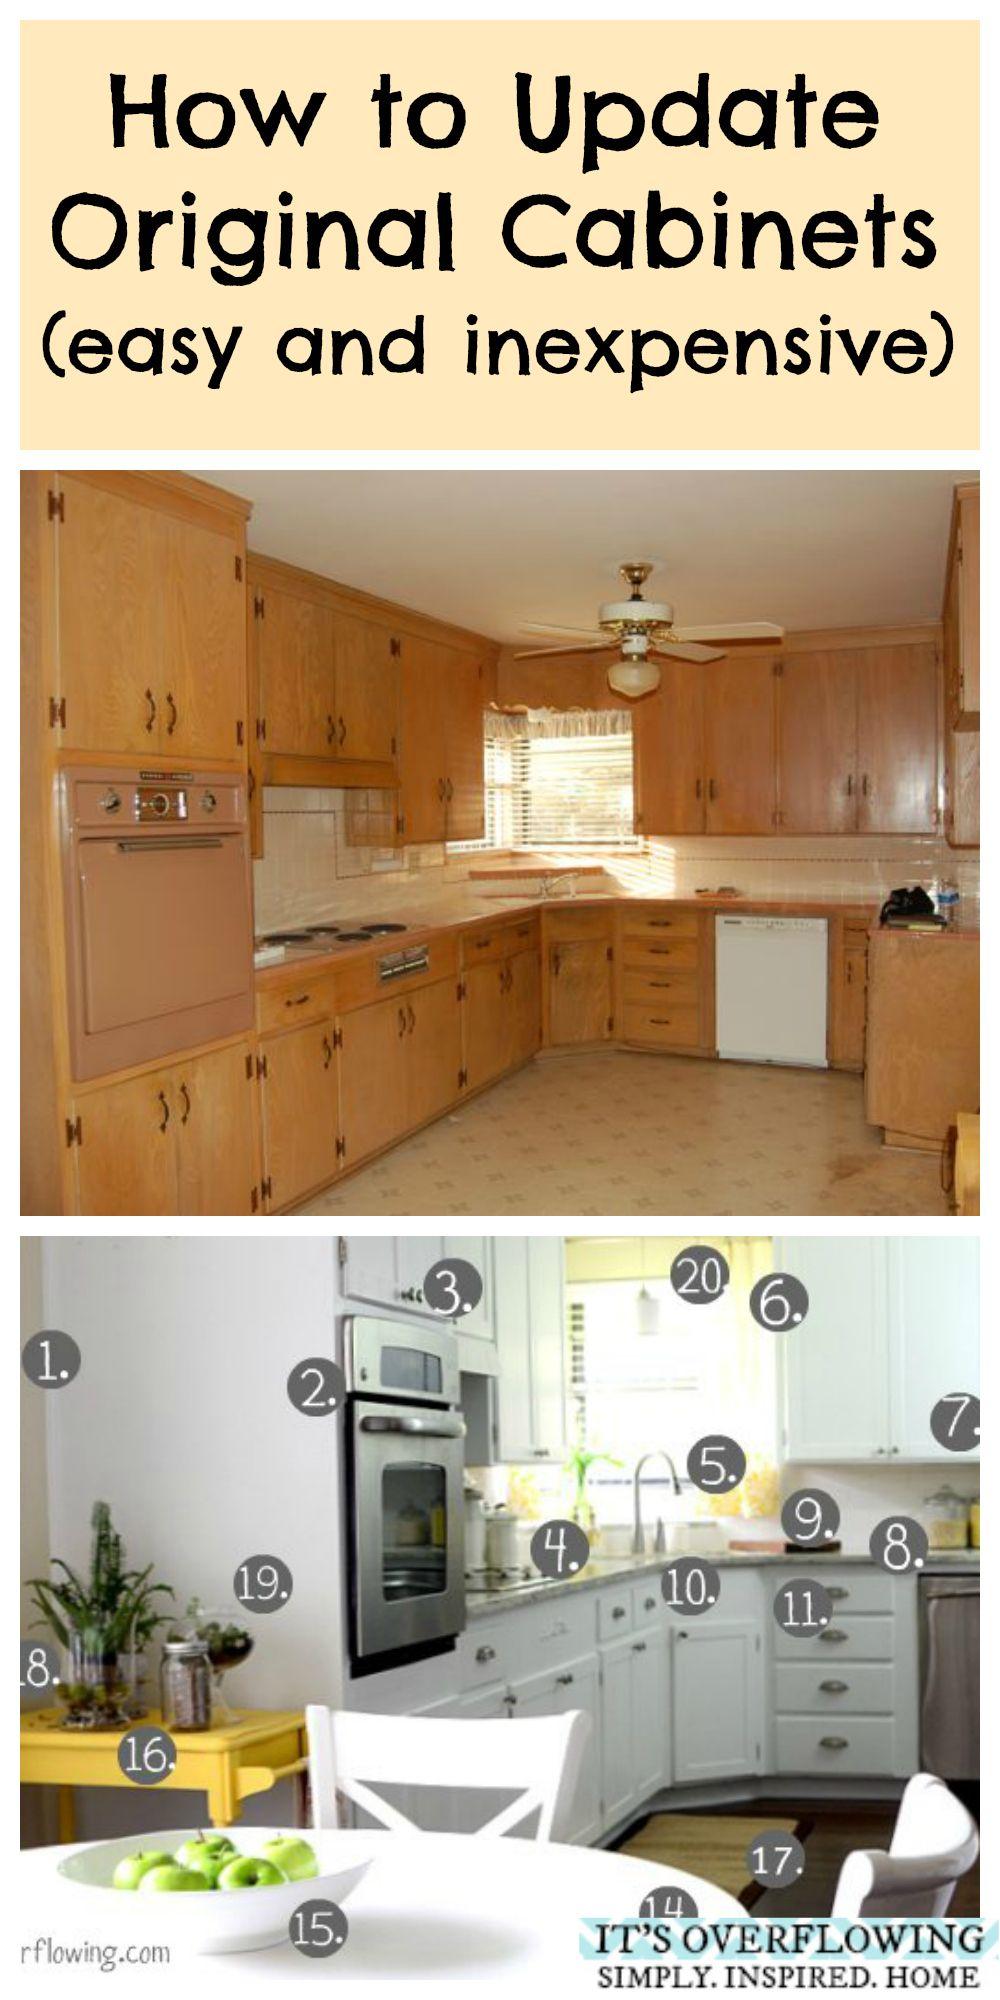 Bluehost Com Kitchen Remodel Home Remodeling Home Kitchens